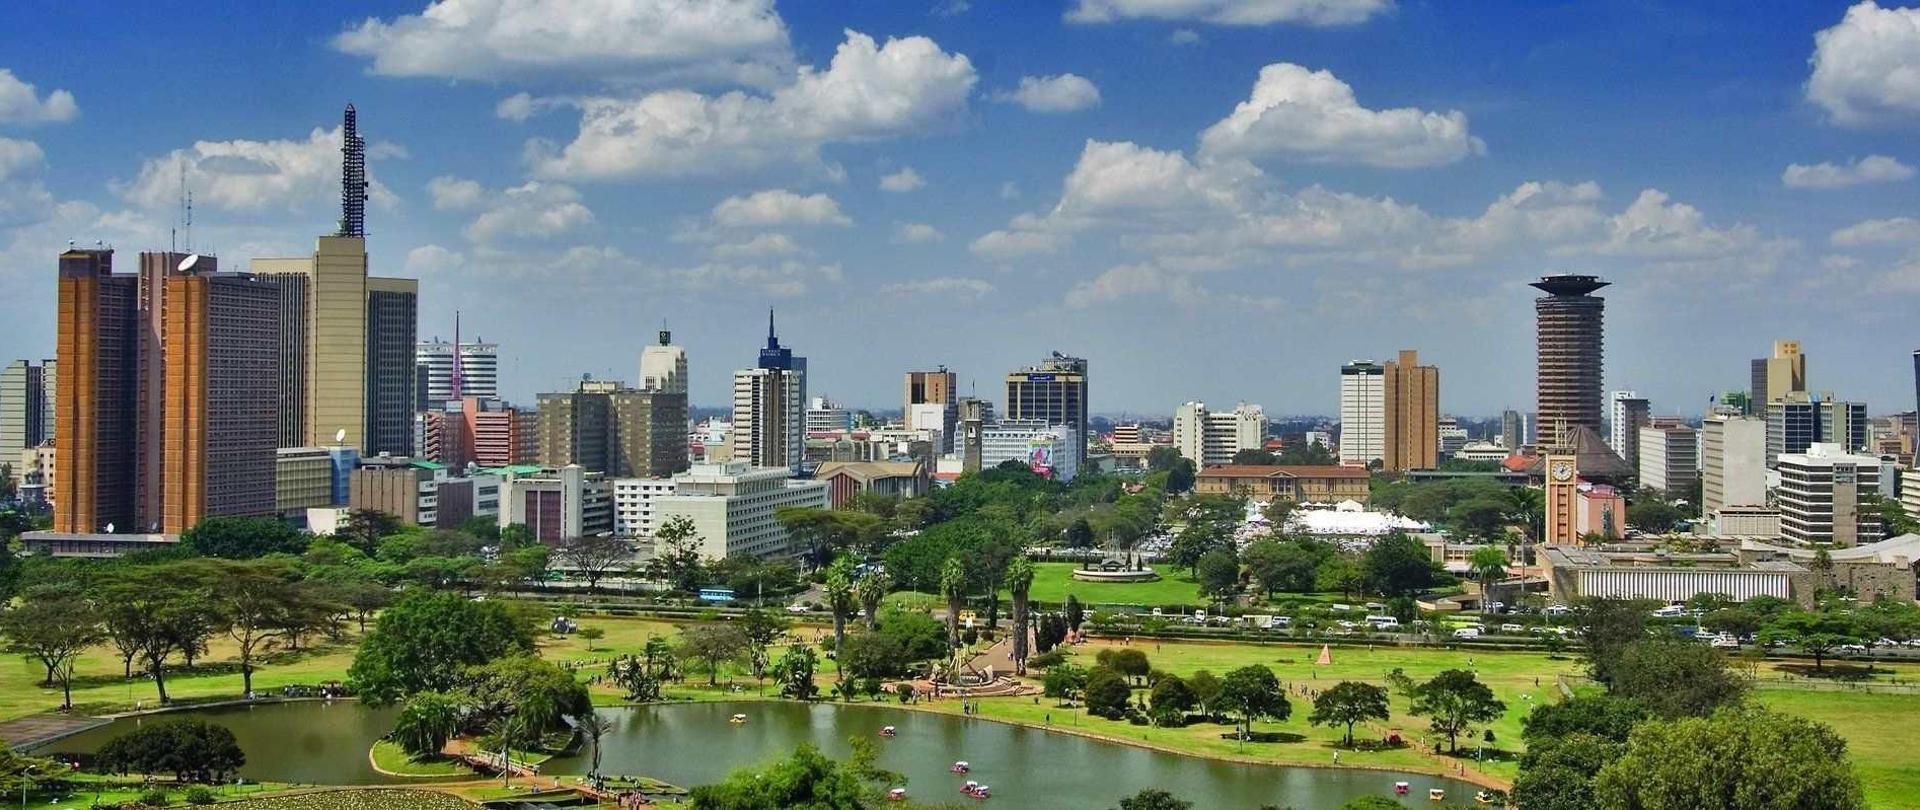 nairobi_city_skyline.jpg